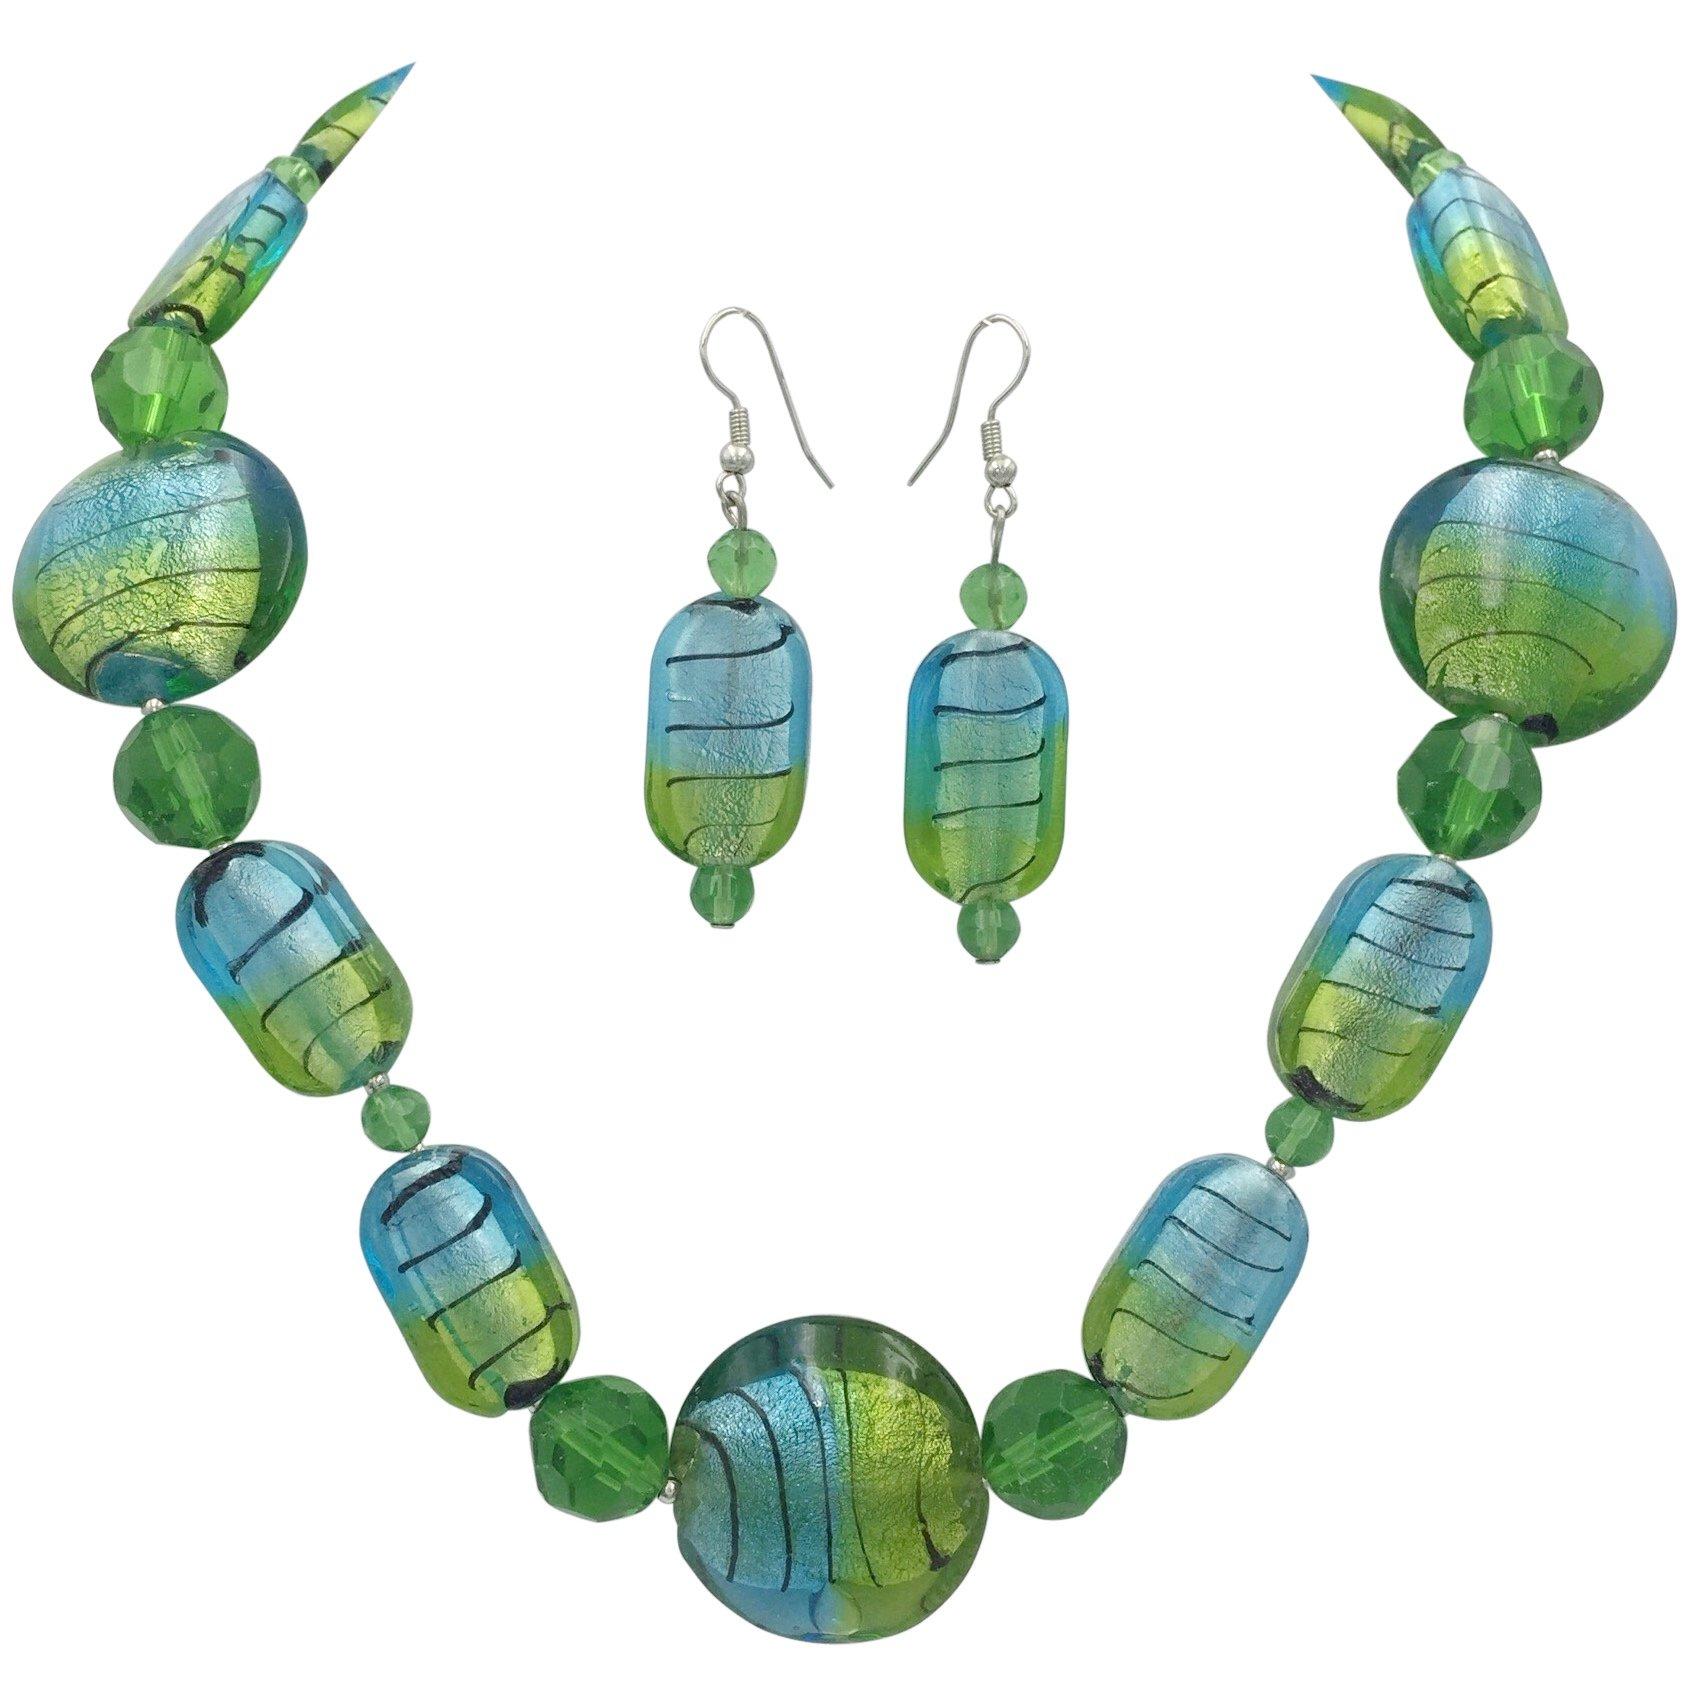 Gypsy Jewels Single Row Simple Beaded Statement Multi Color Necklace & Dangle Earrings Set (Light Blue & Green Swirl Glass)